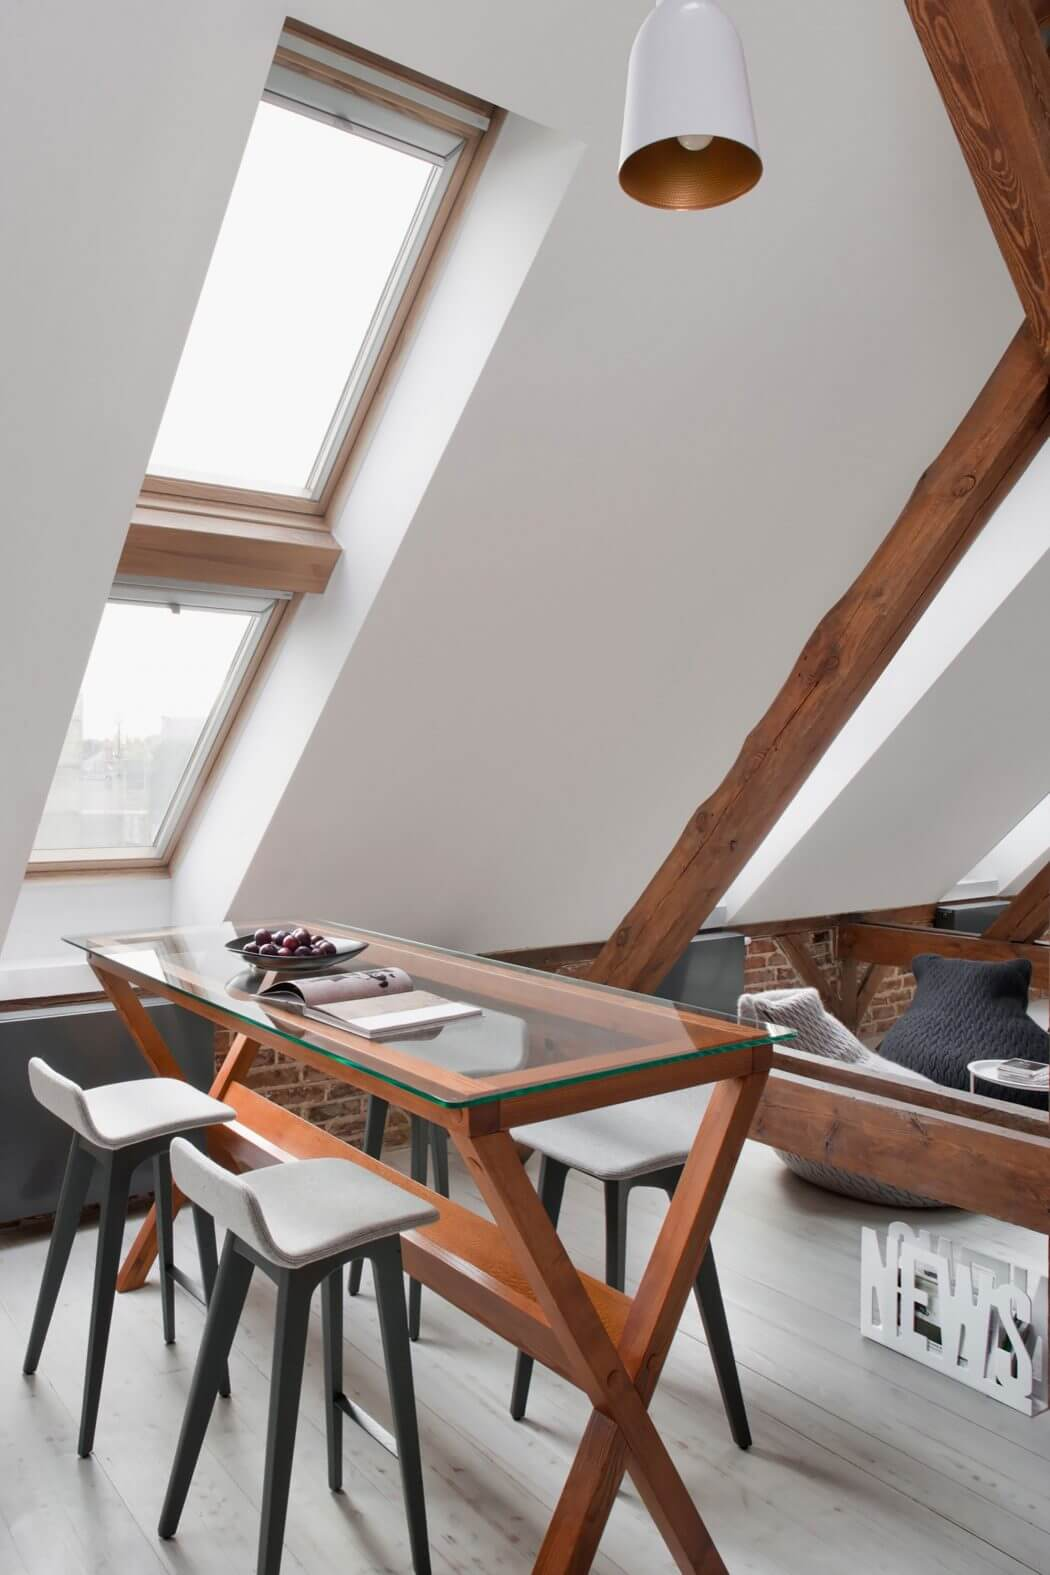 007-apartment-pozna-cuns-studio-designs_virlovastyle